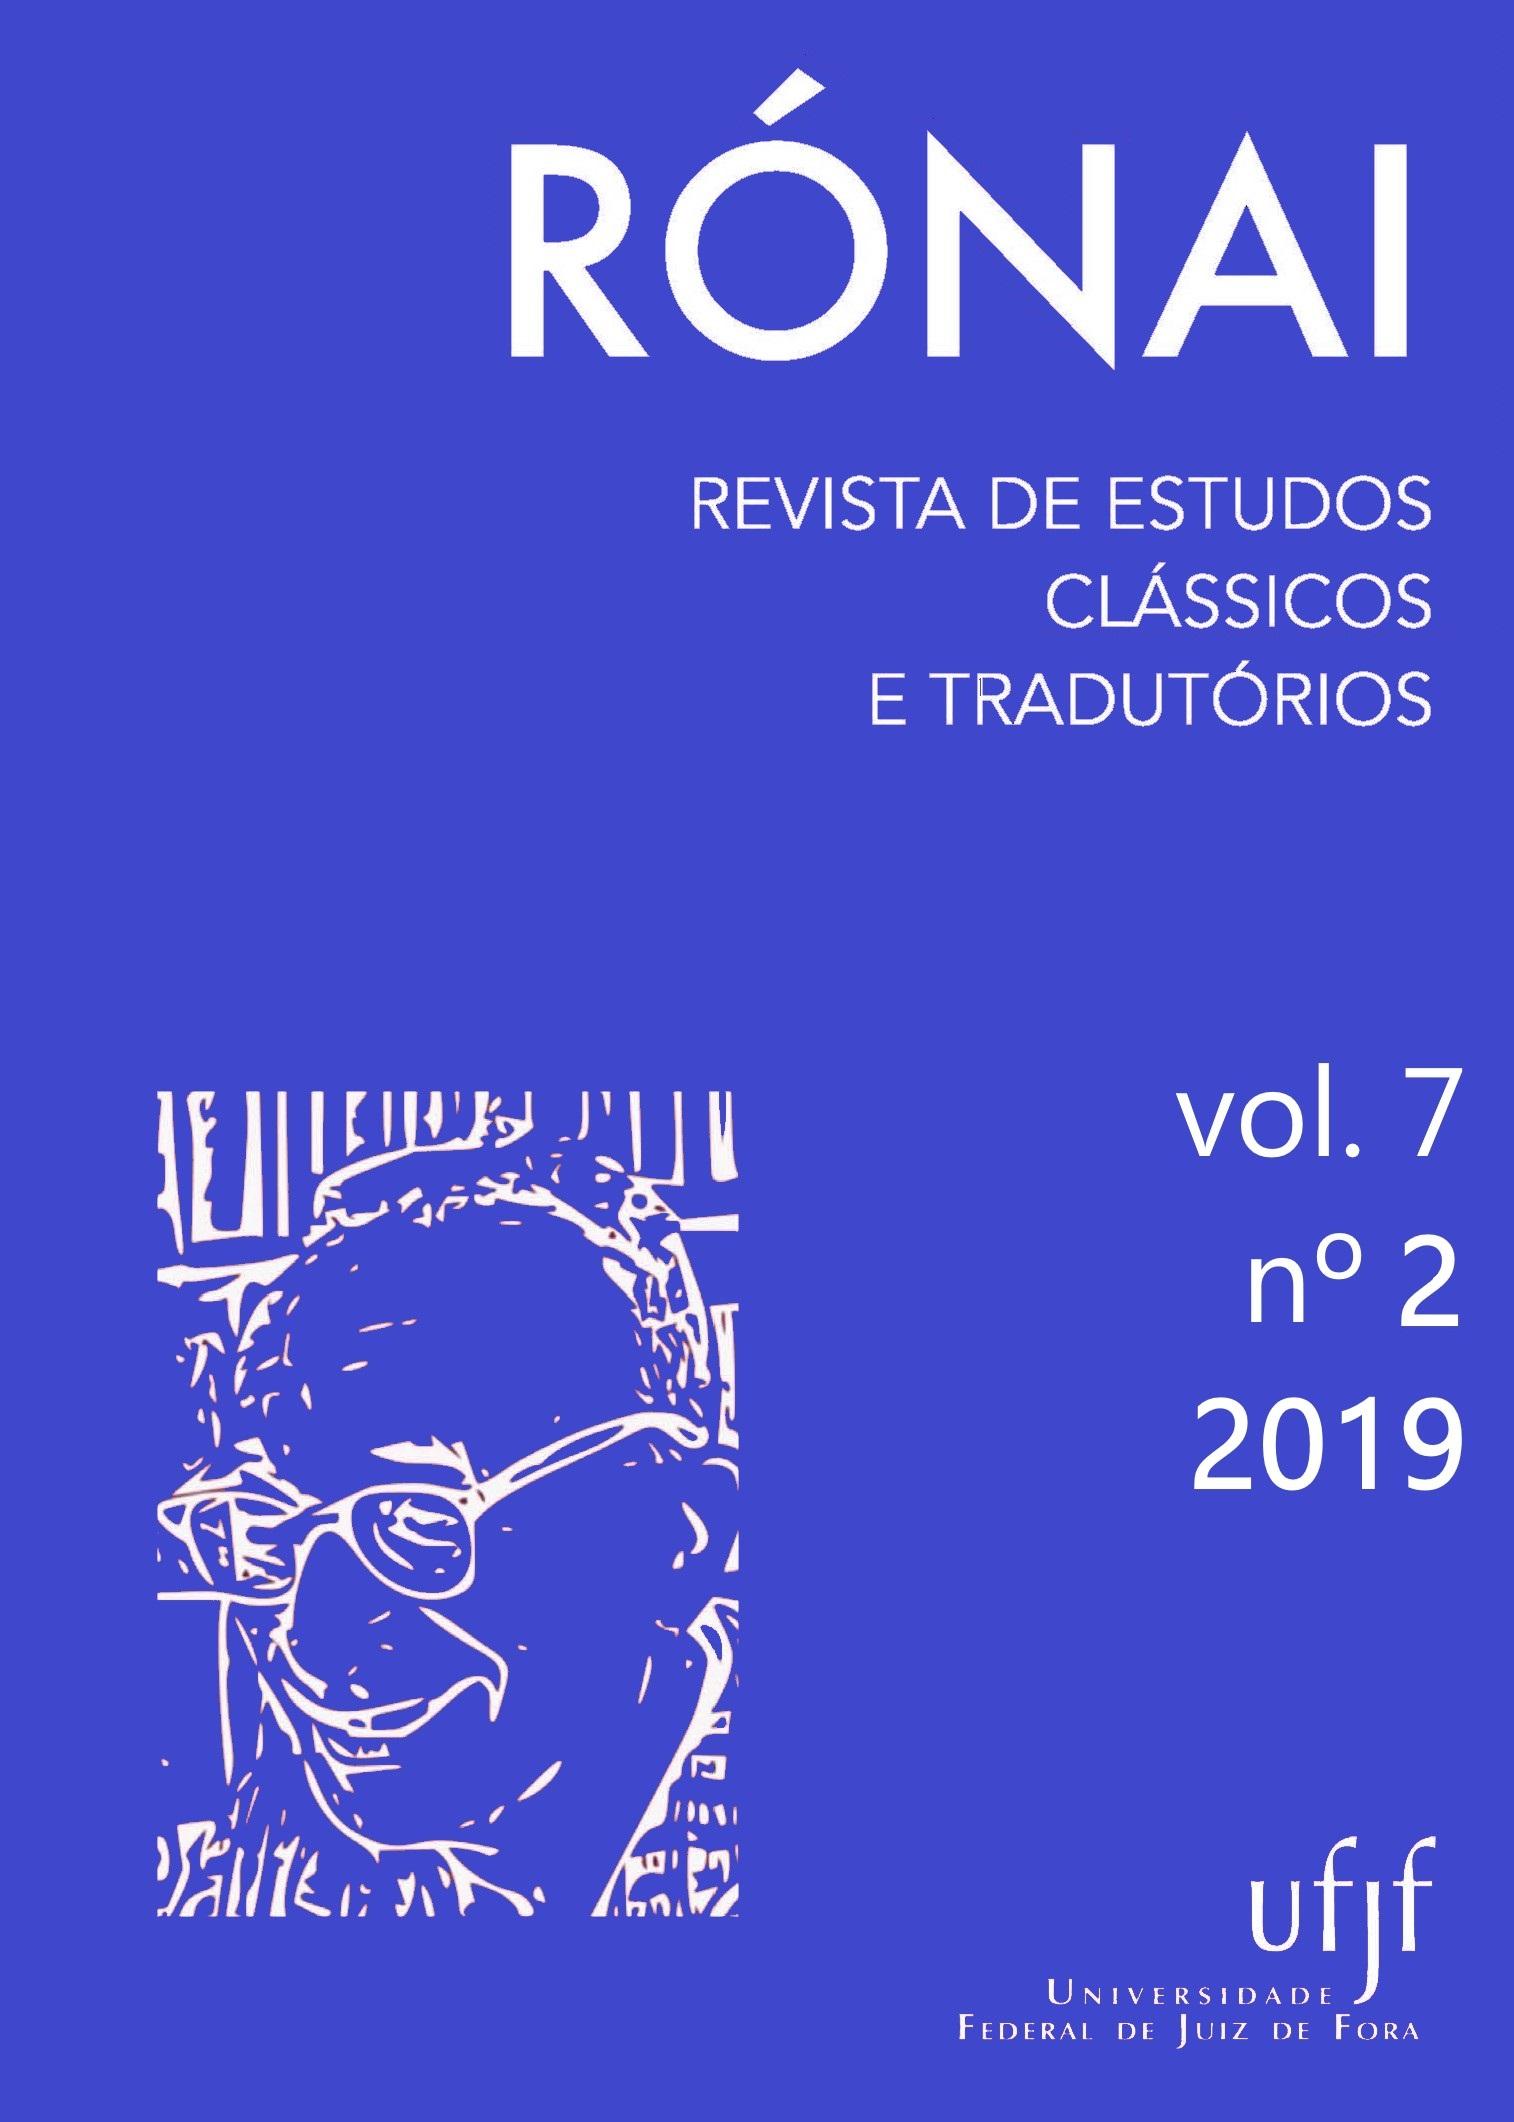 Capa do volume 7, número 2, do ano de 2019 da revista Rónai - Revista de Estudos Clássicos e Tradutórios